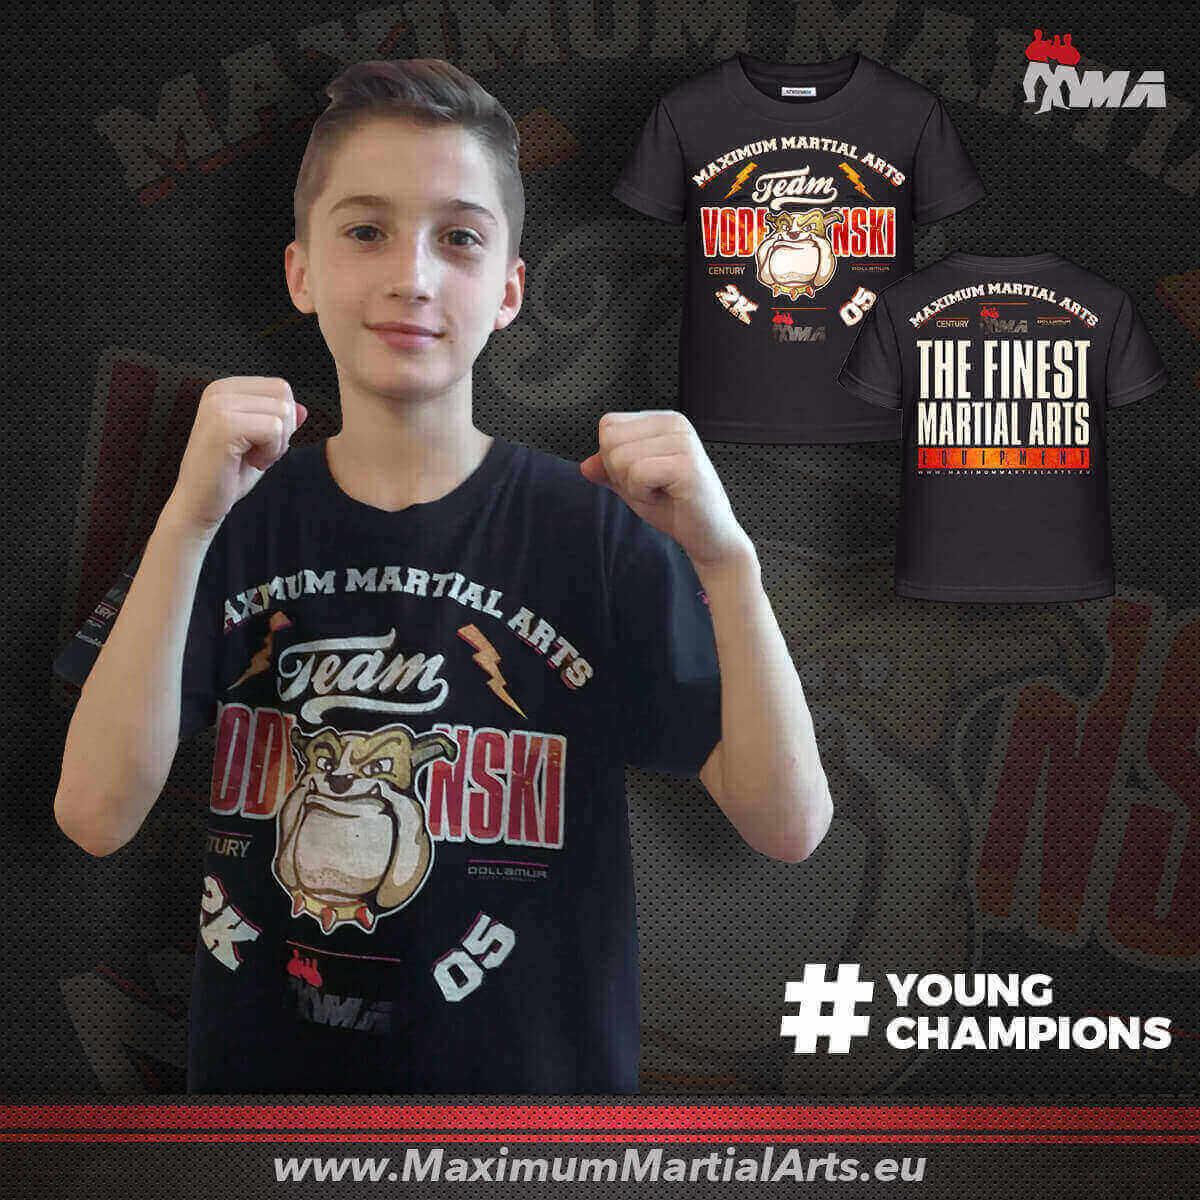 Support Christian Vodenski - YoungChampion